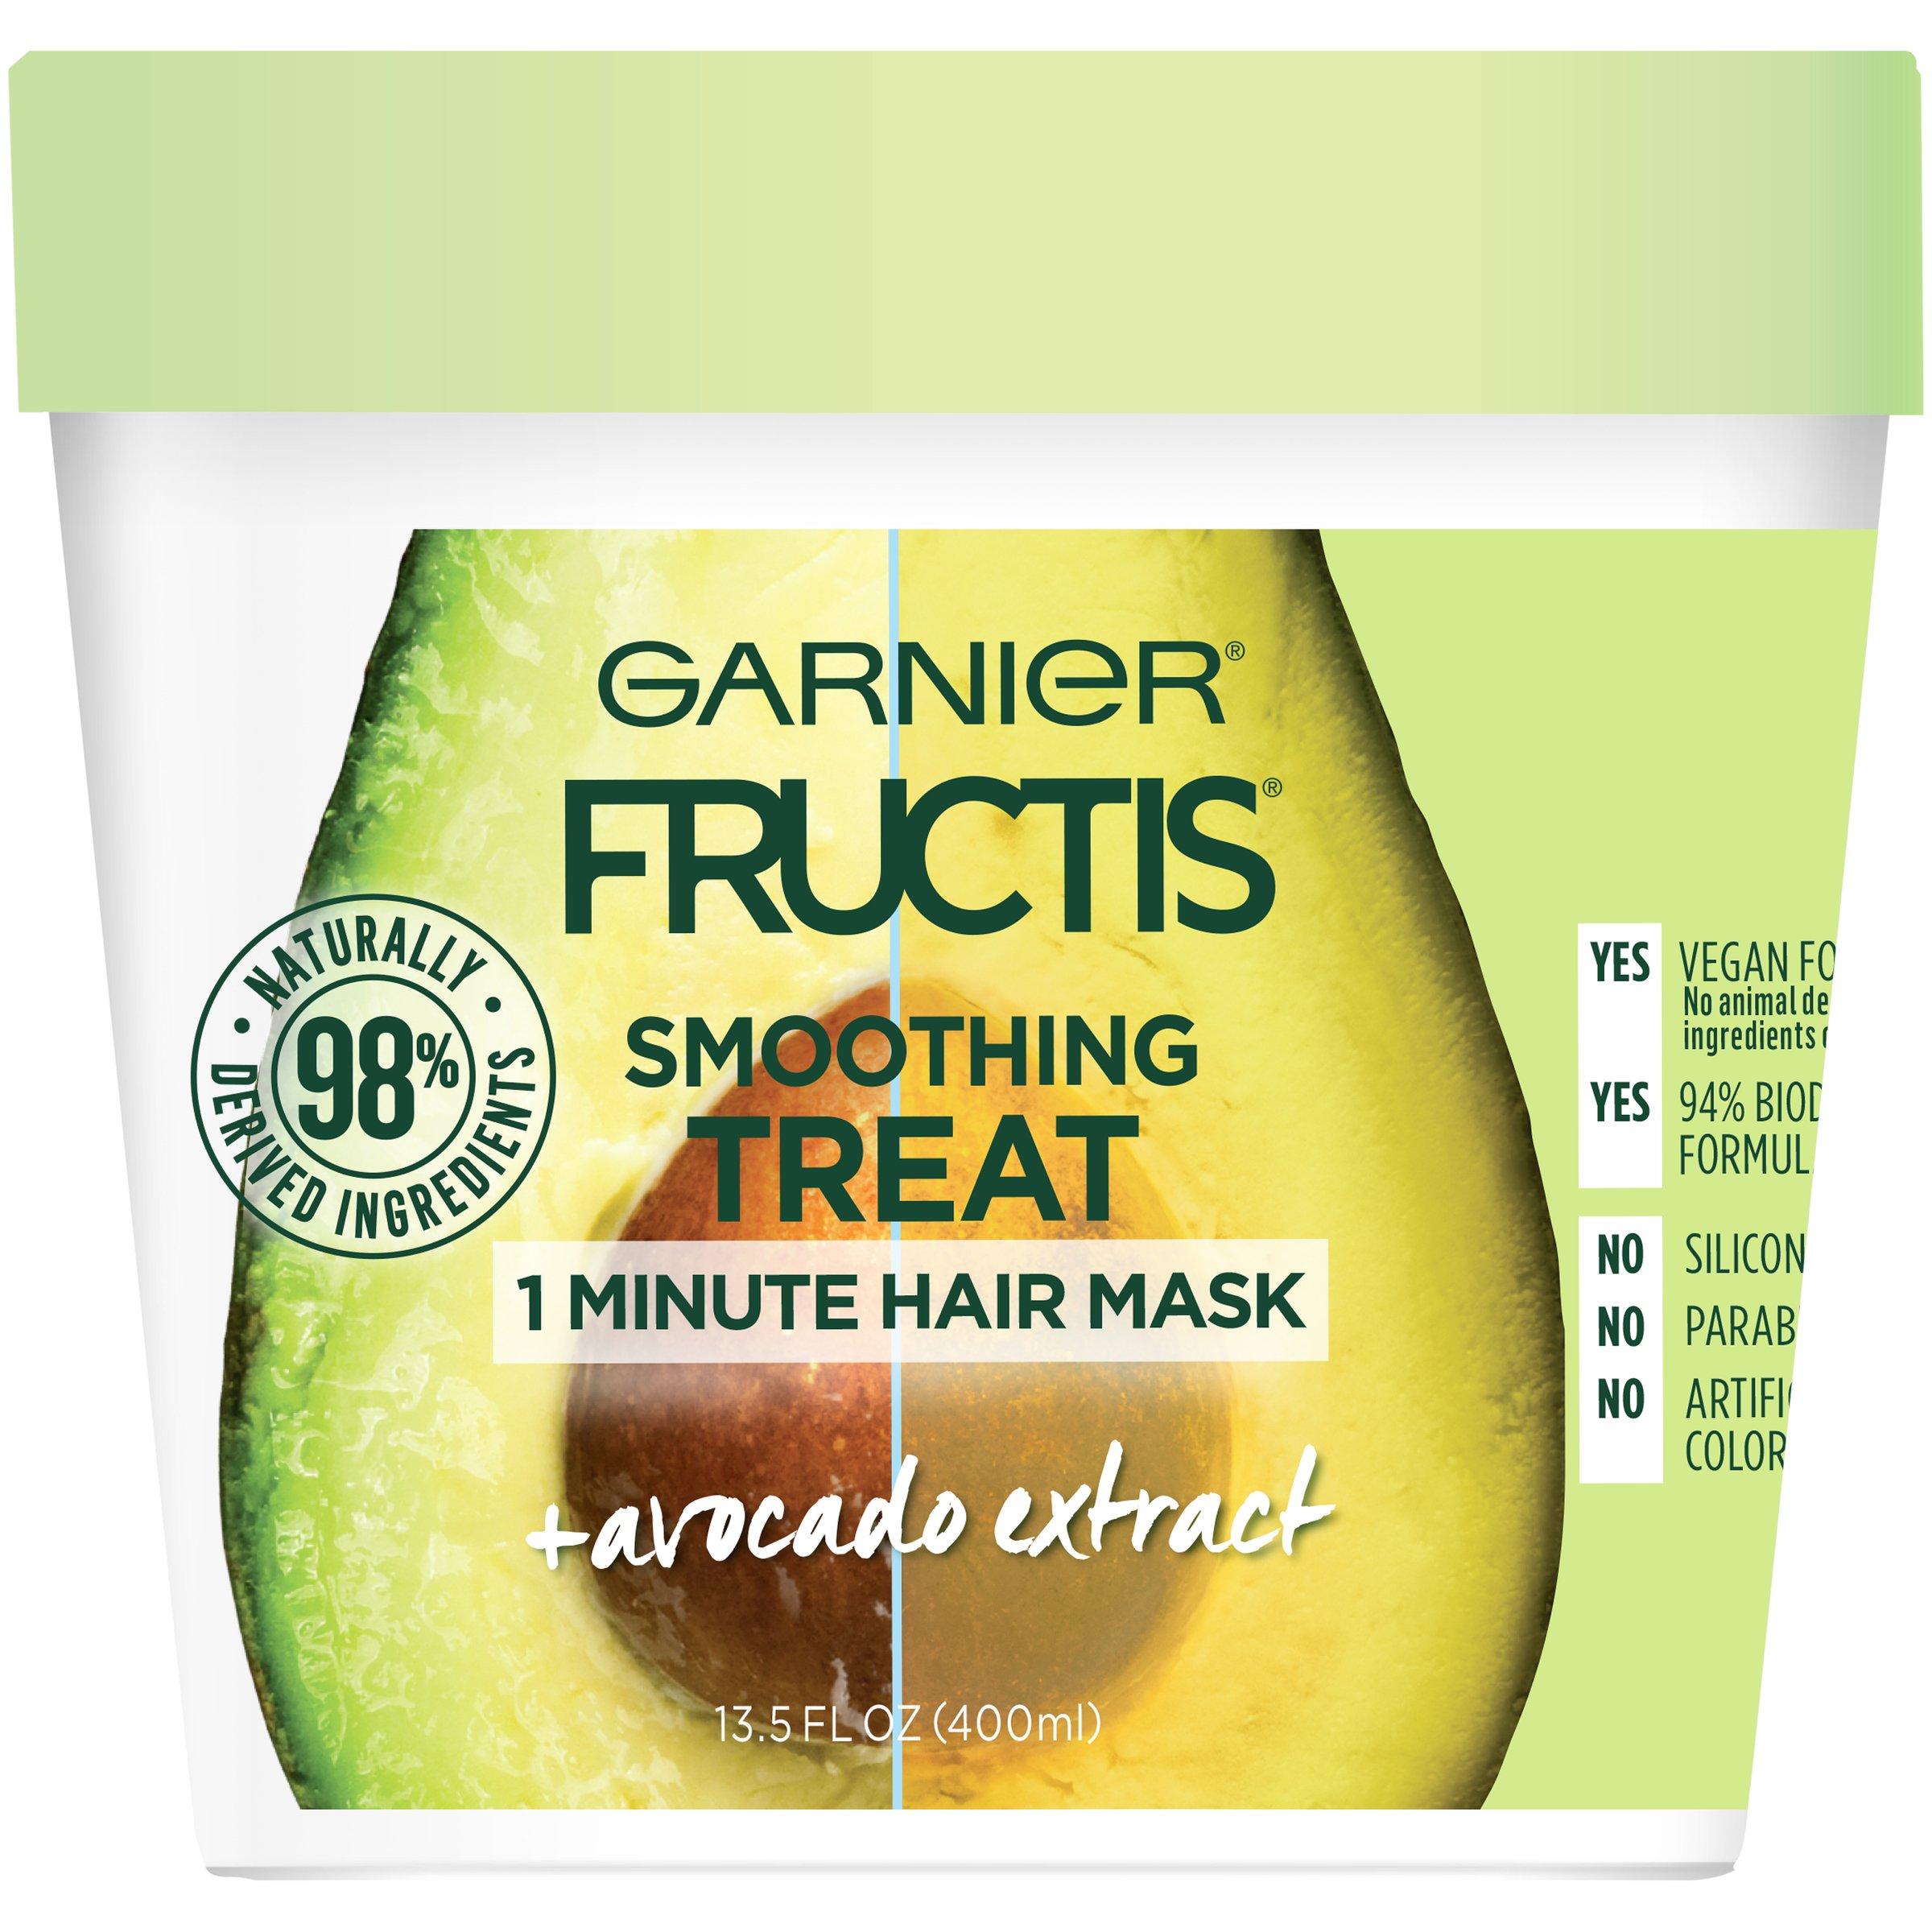 garnier hair mask how to use